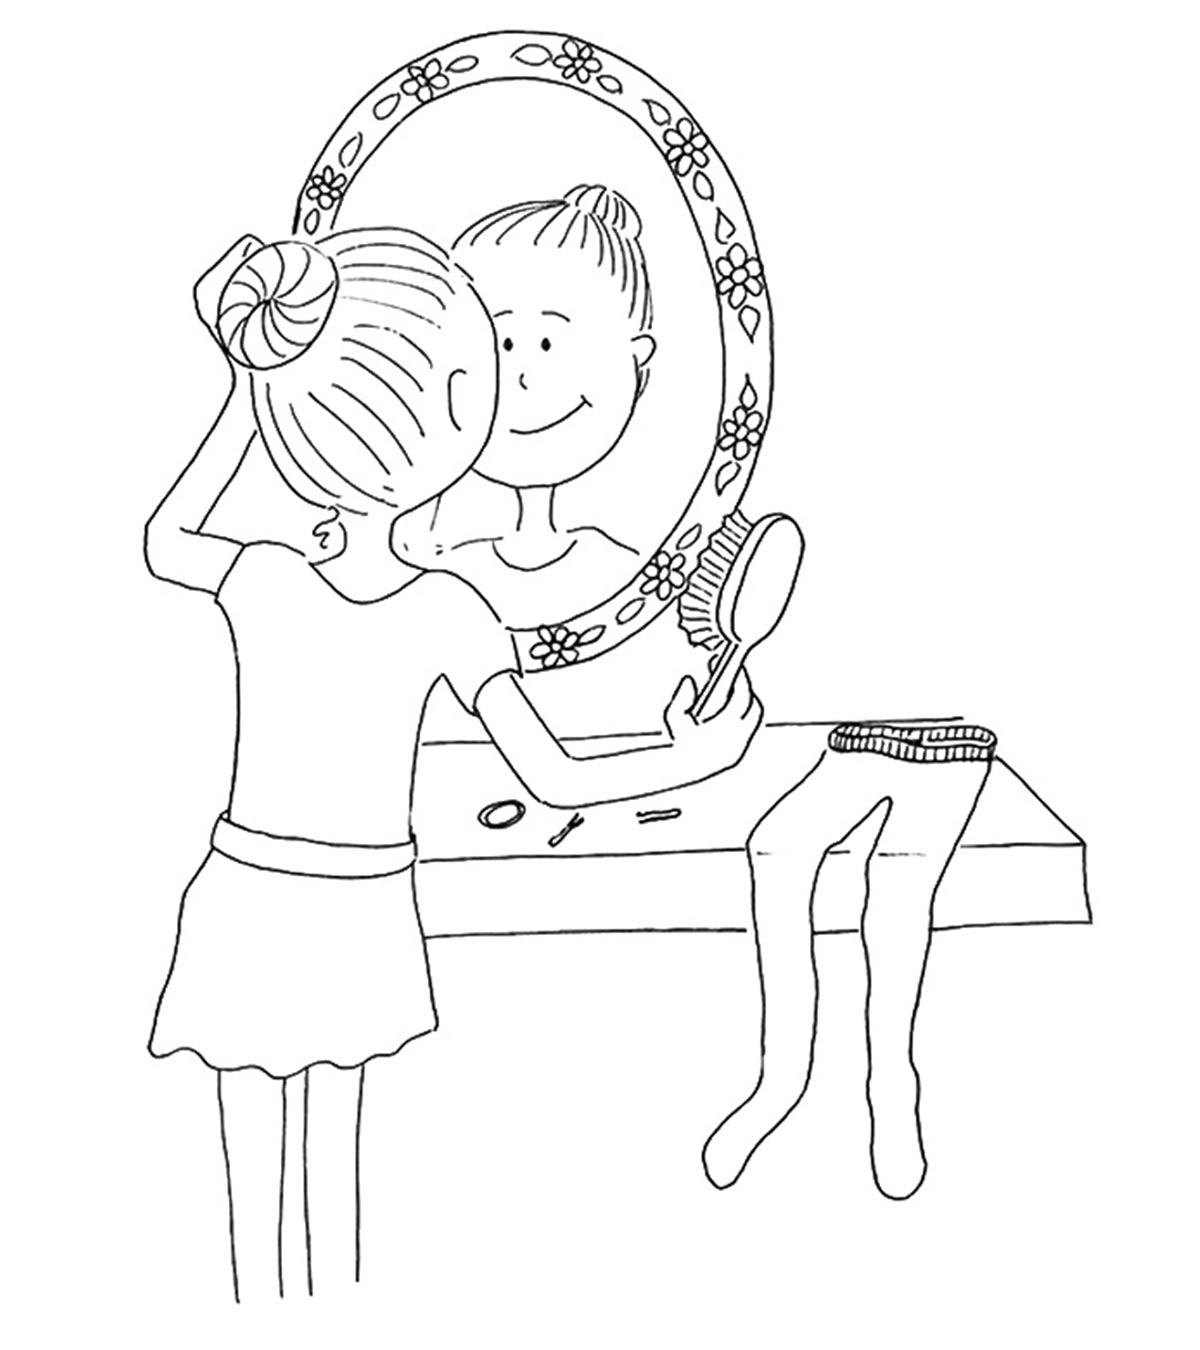 Bratz pom pom girls coloring pages - Hellokids.com | 1350x1200